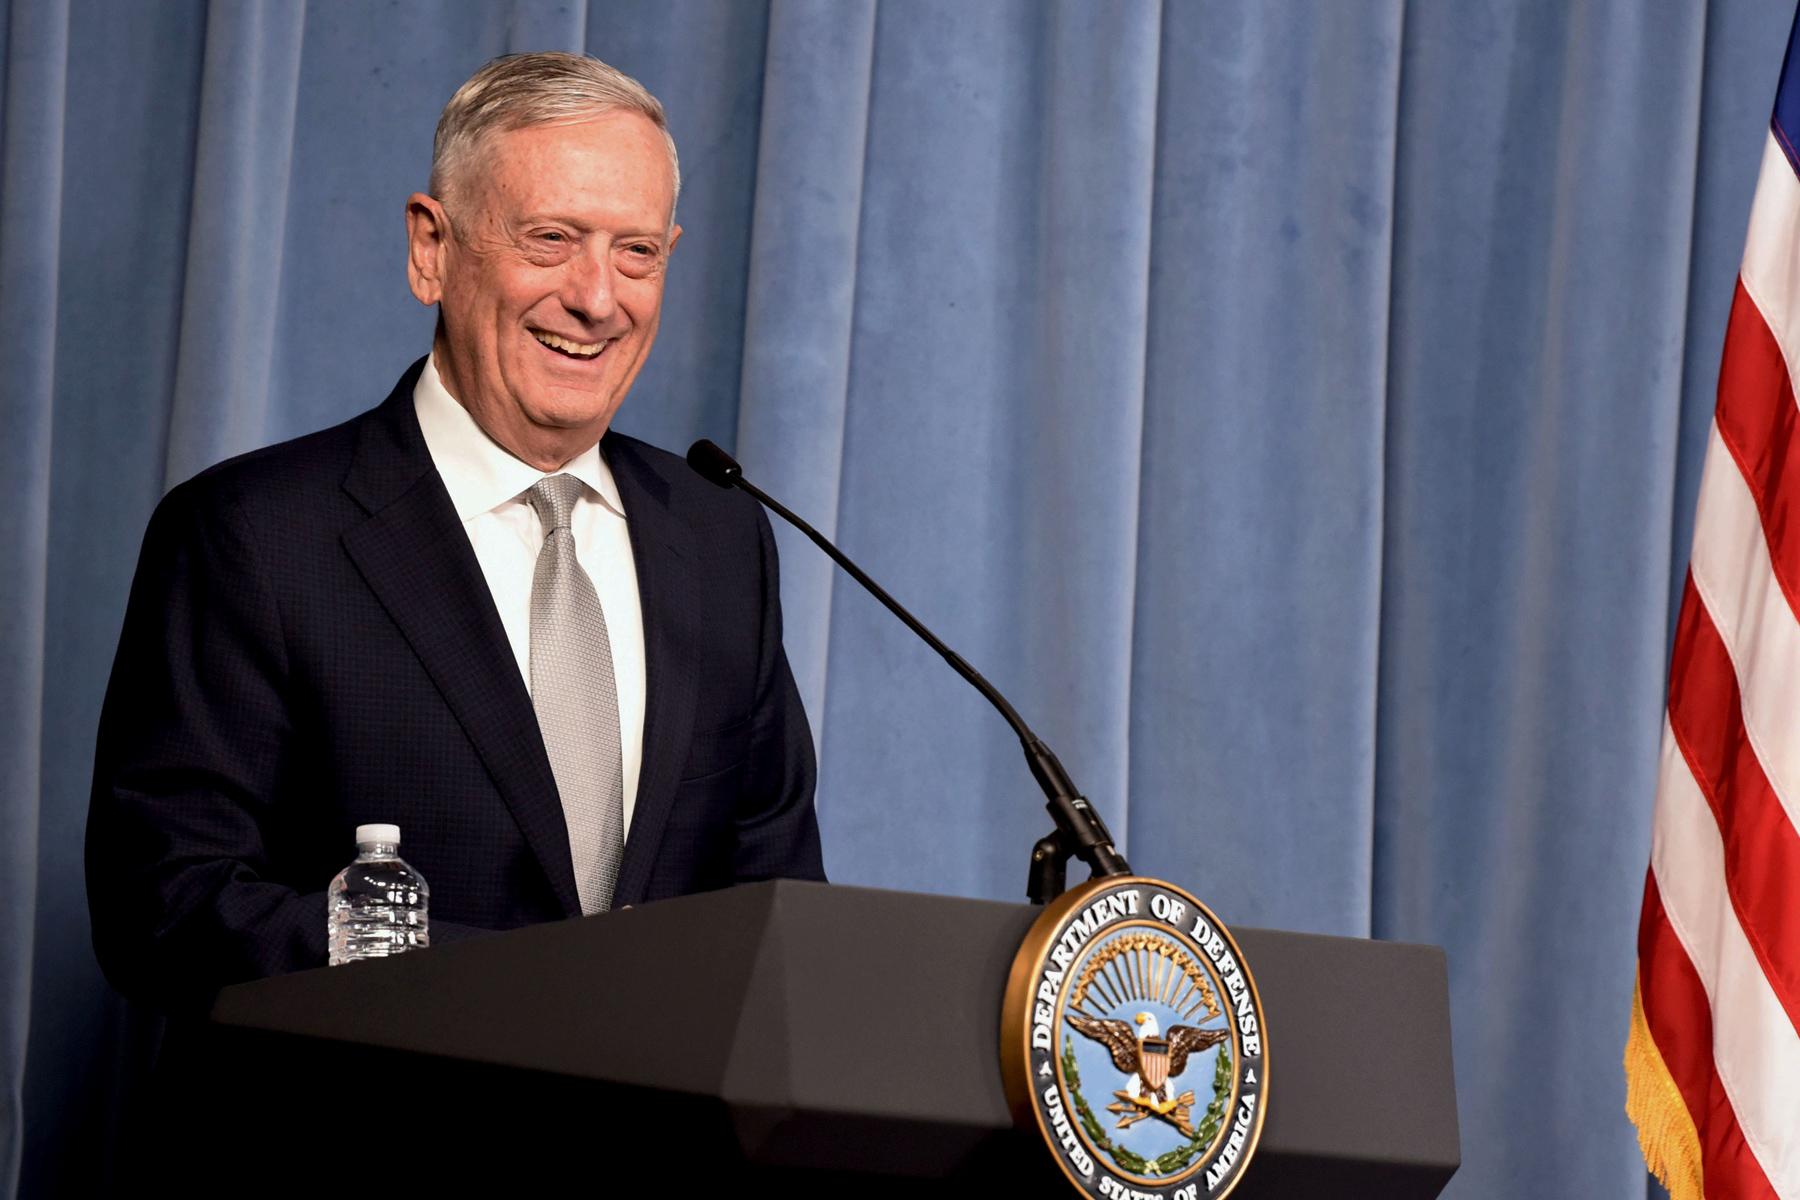 Mattis Joins Advisory Group Run By Former Defense